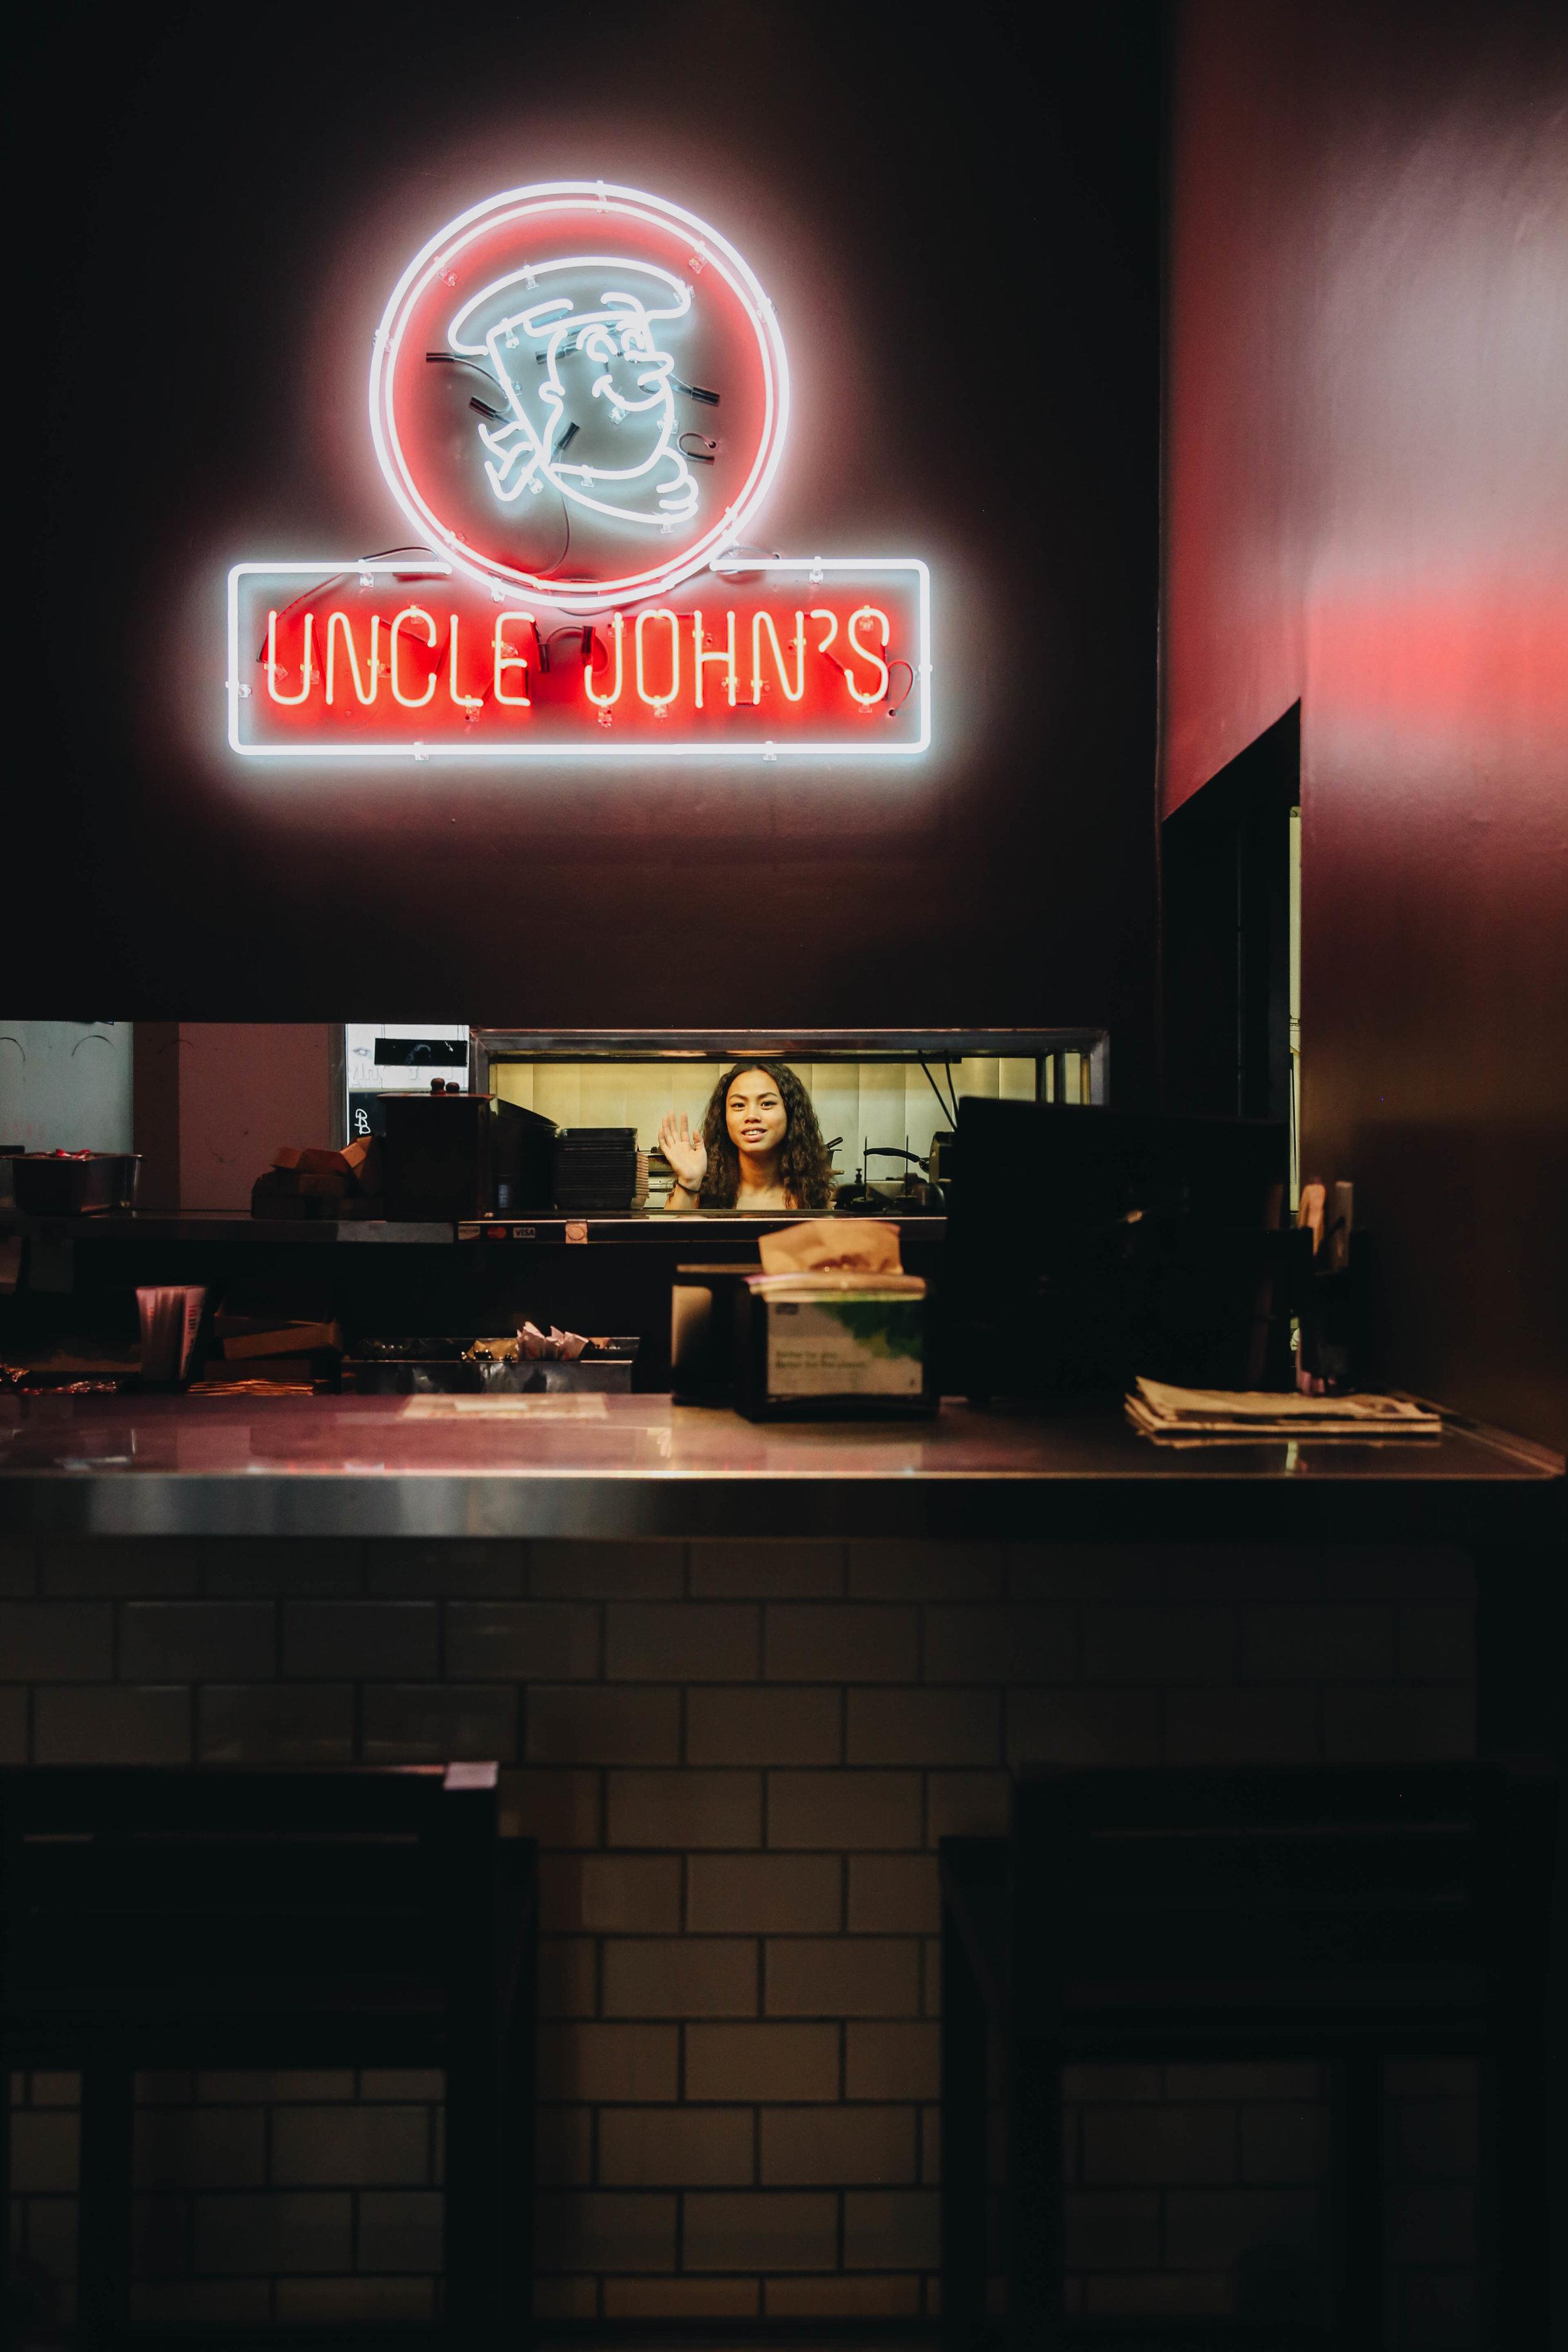 LA-Downtowner-Uncle-Johns-Cafe-1.jpg